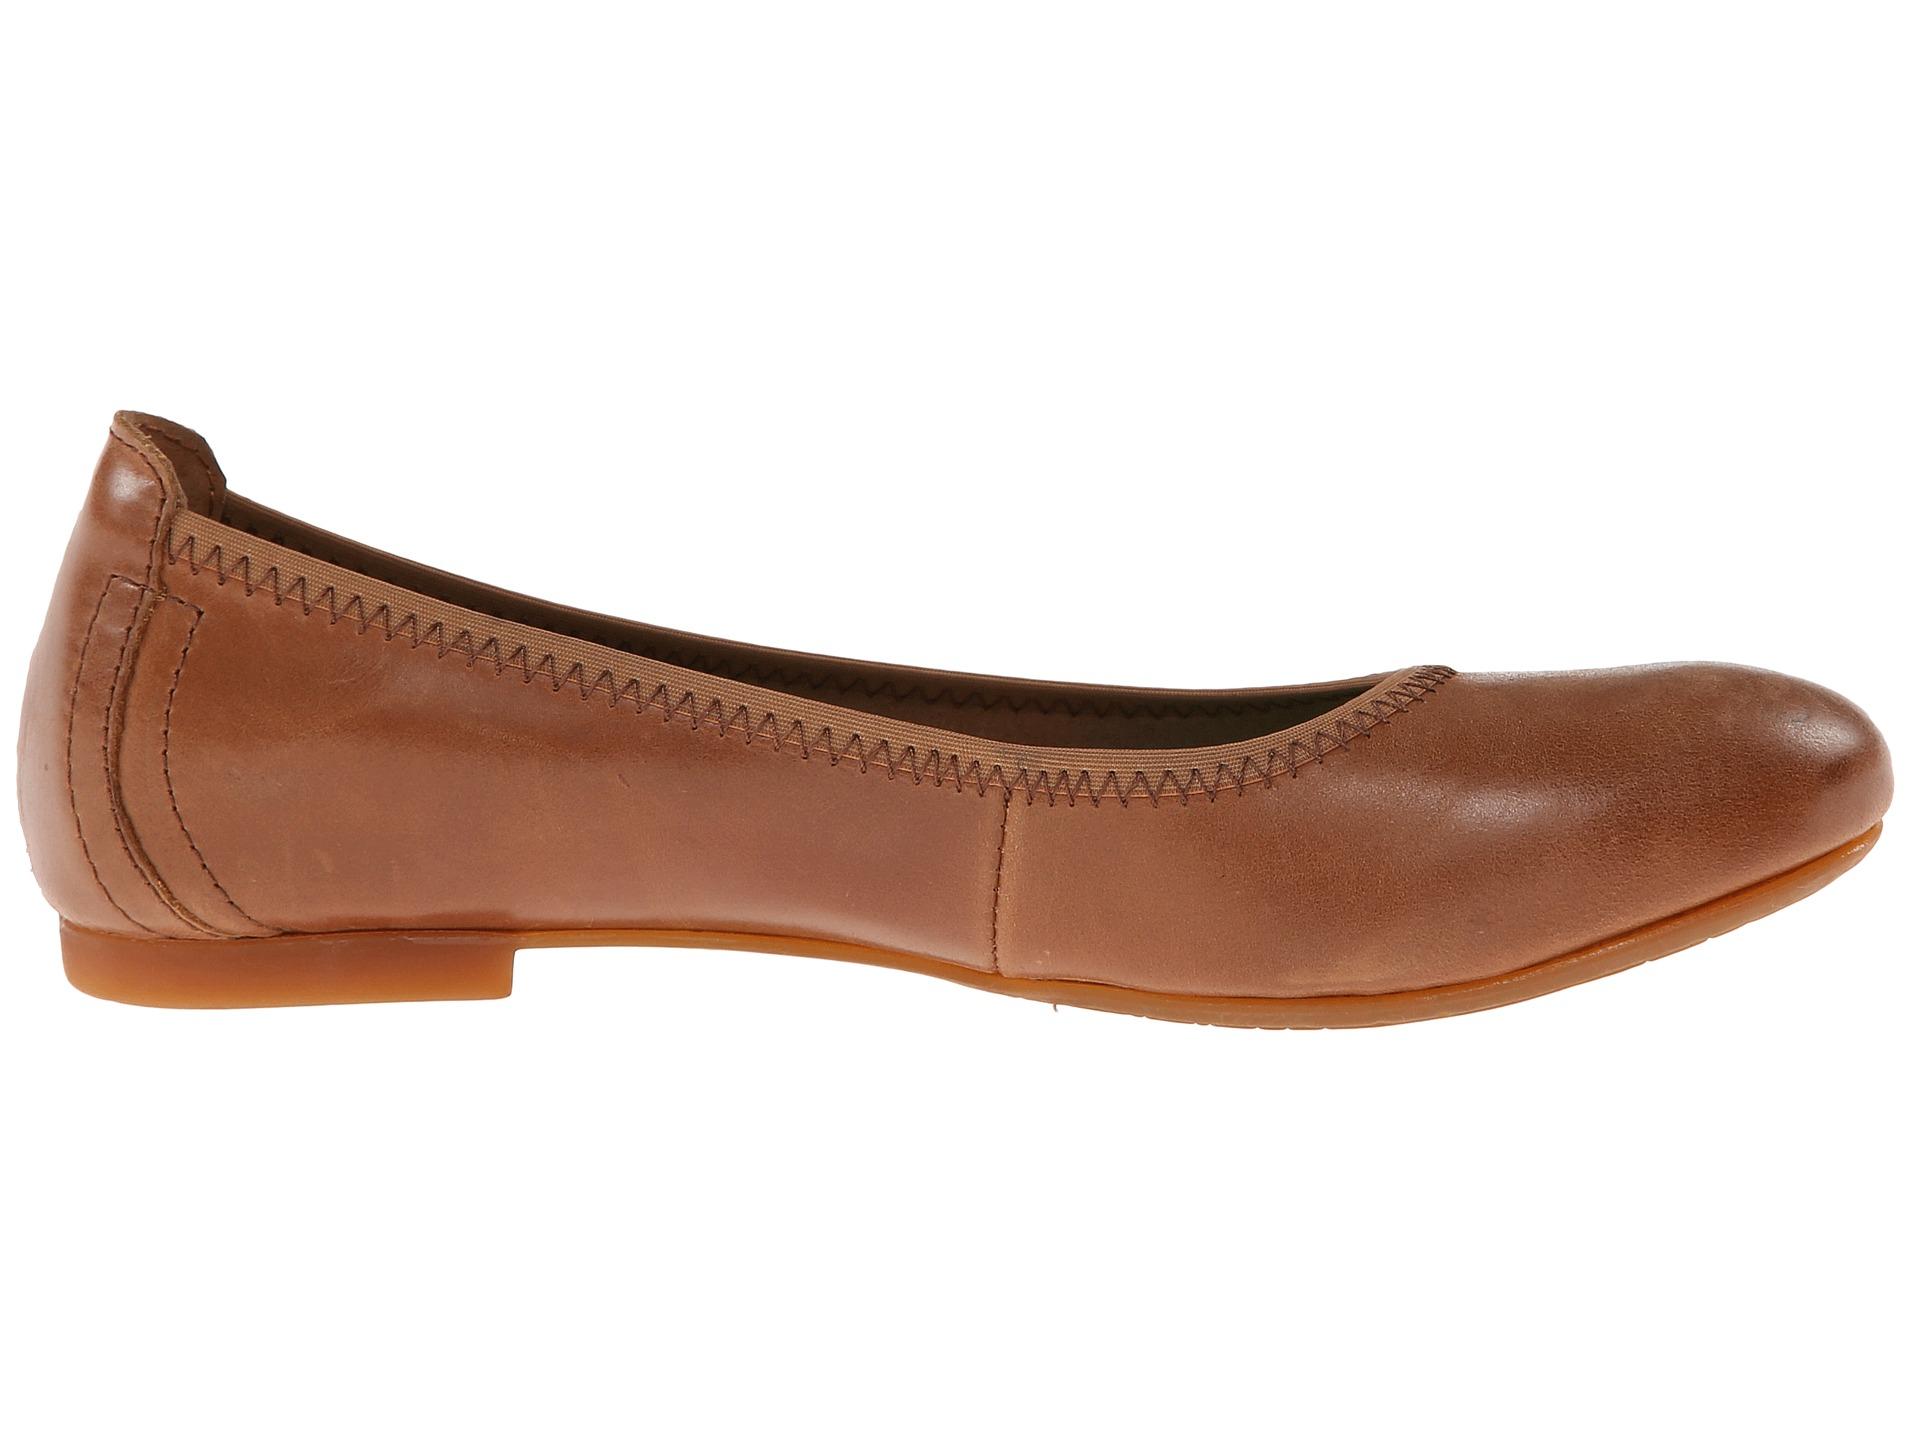 Zappos Vip Shoes Flats